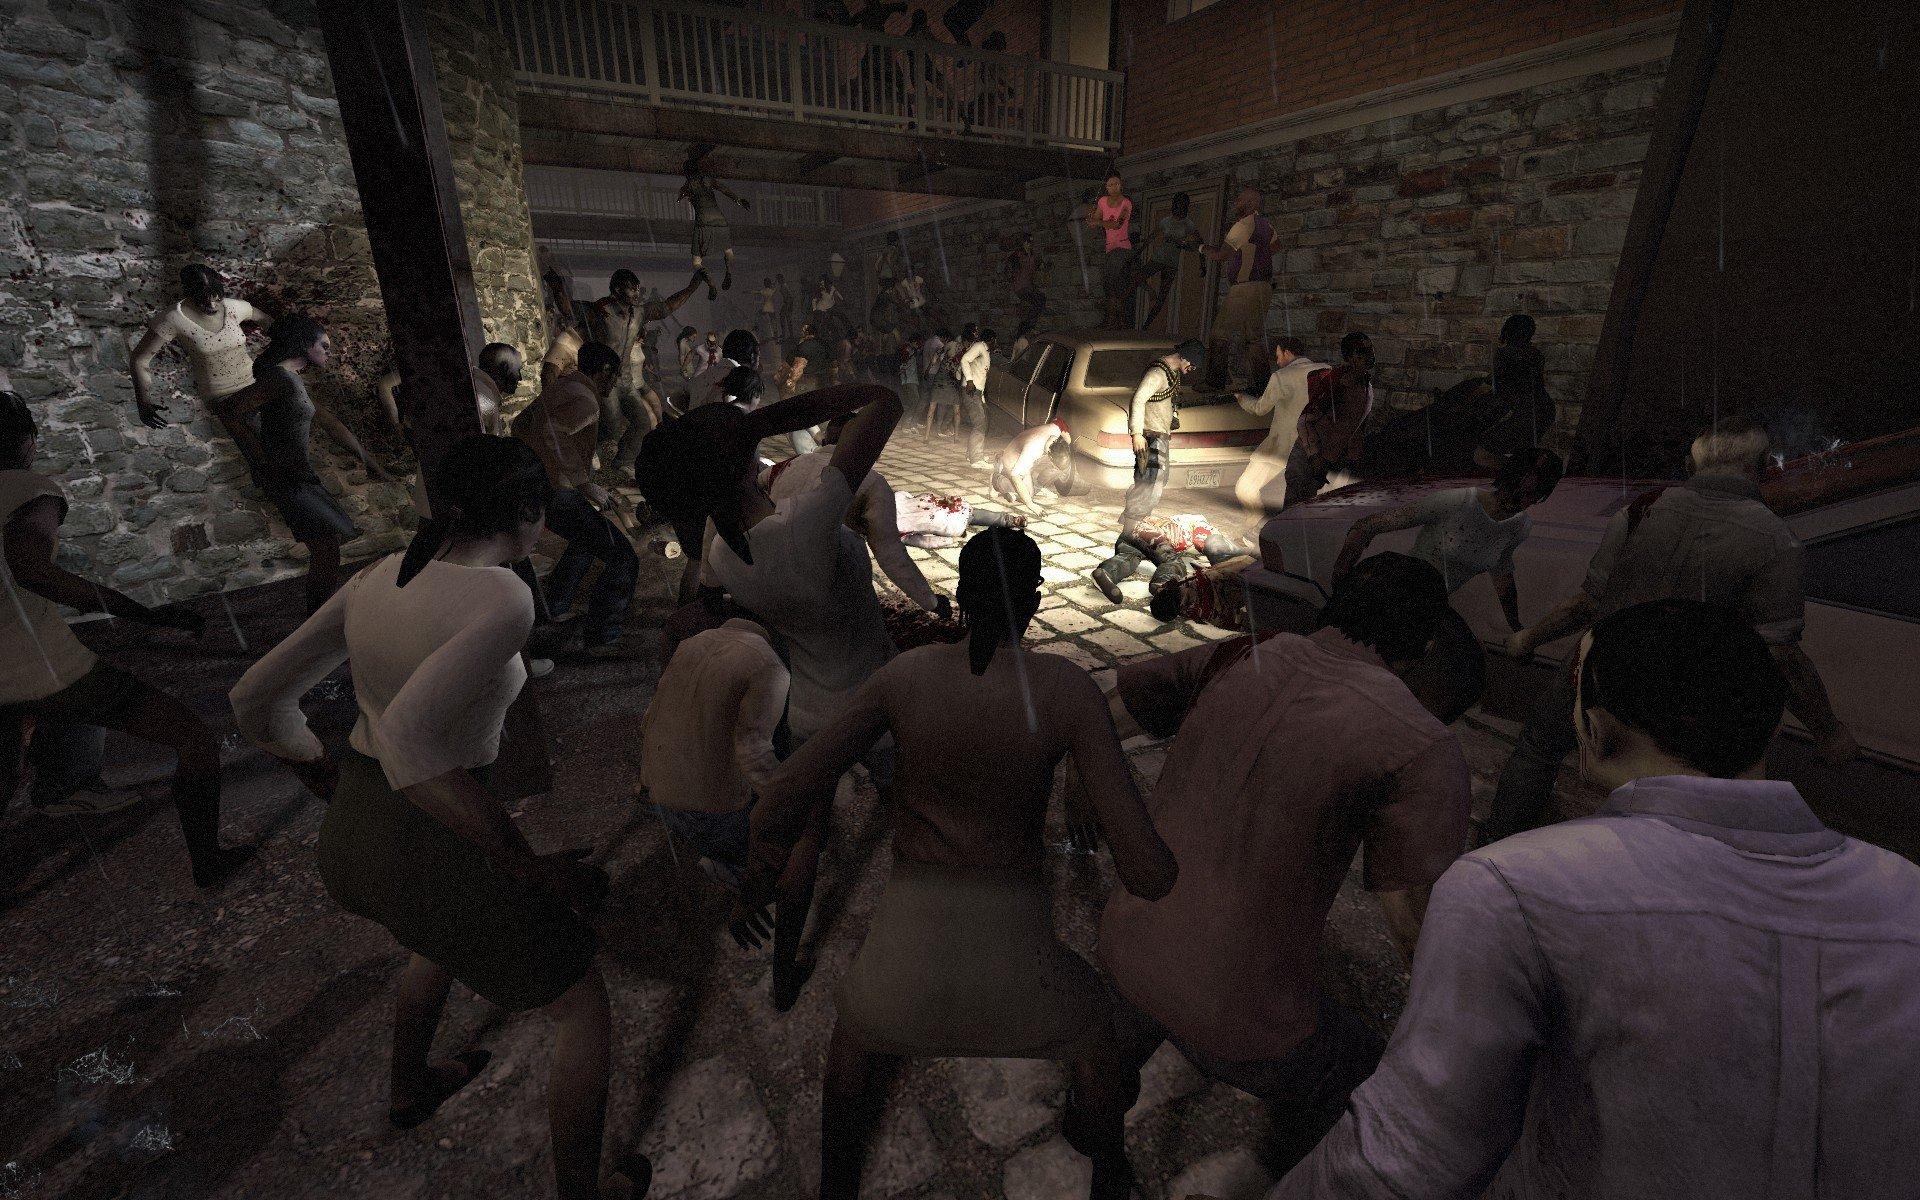 The Passing para Left 4 Dead 2 llega esta semana [DLC]